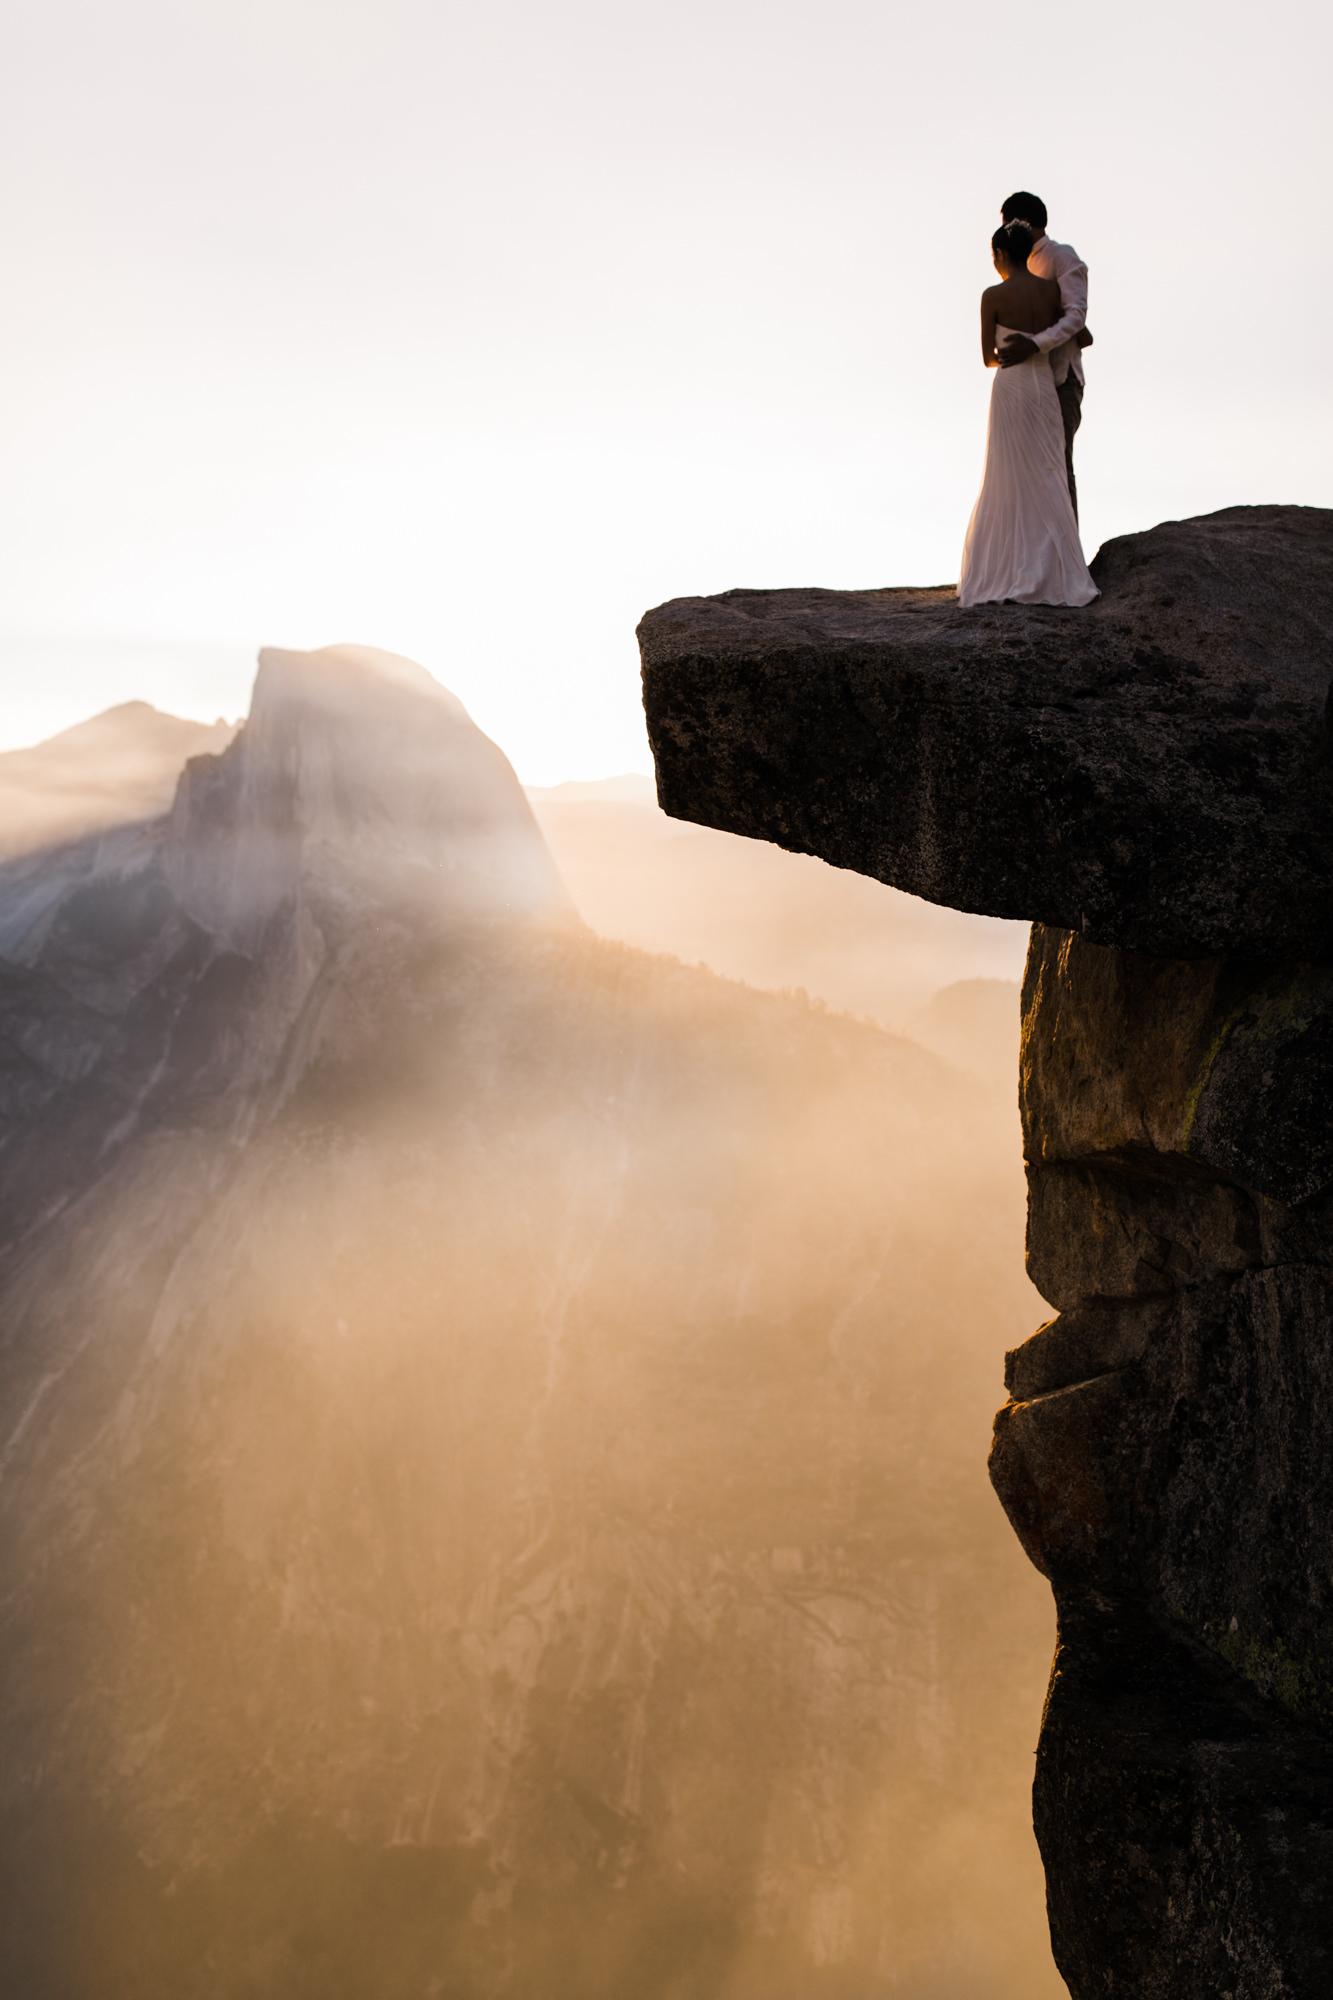 sunrise elopement at glacier point in yosemite national park | destination adventure wedding photographers | the hearnes adventure photography | www.thehearnes.com